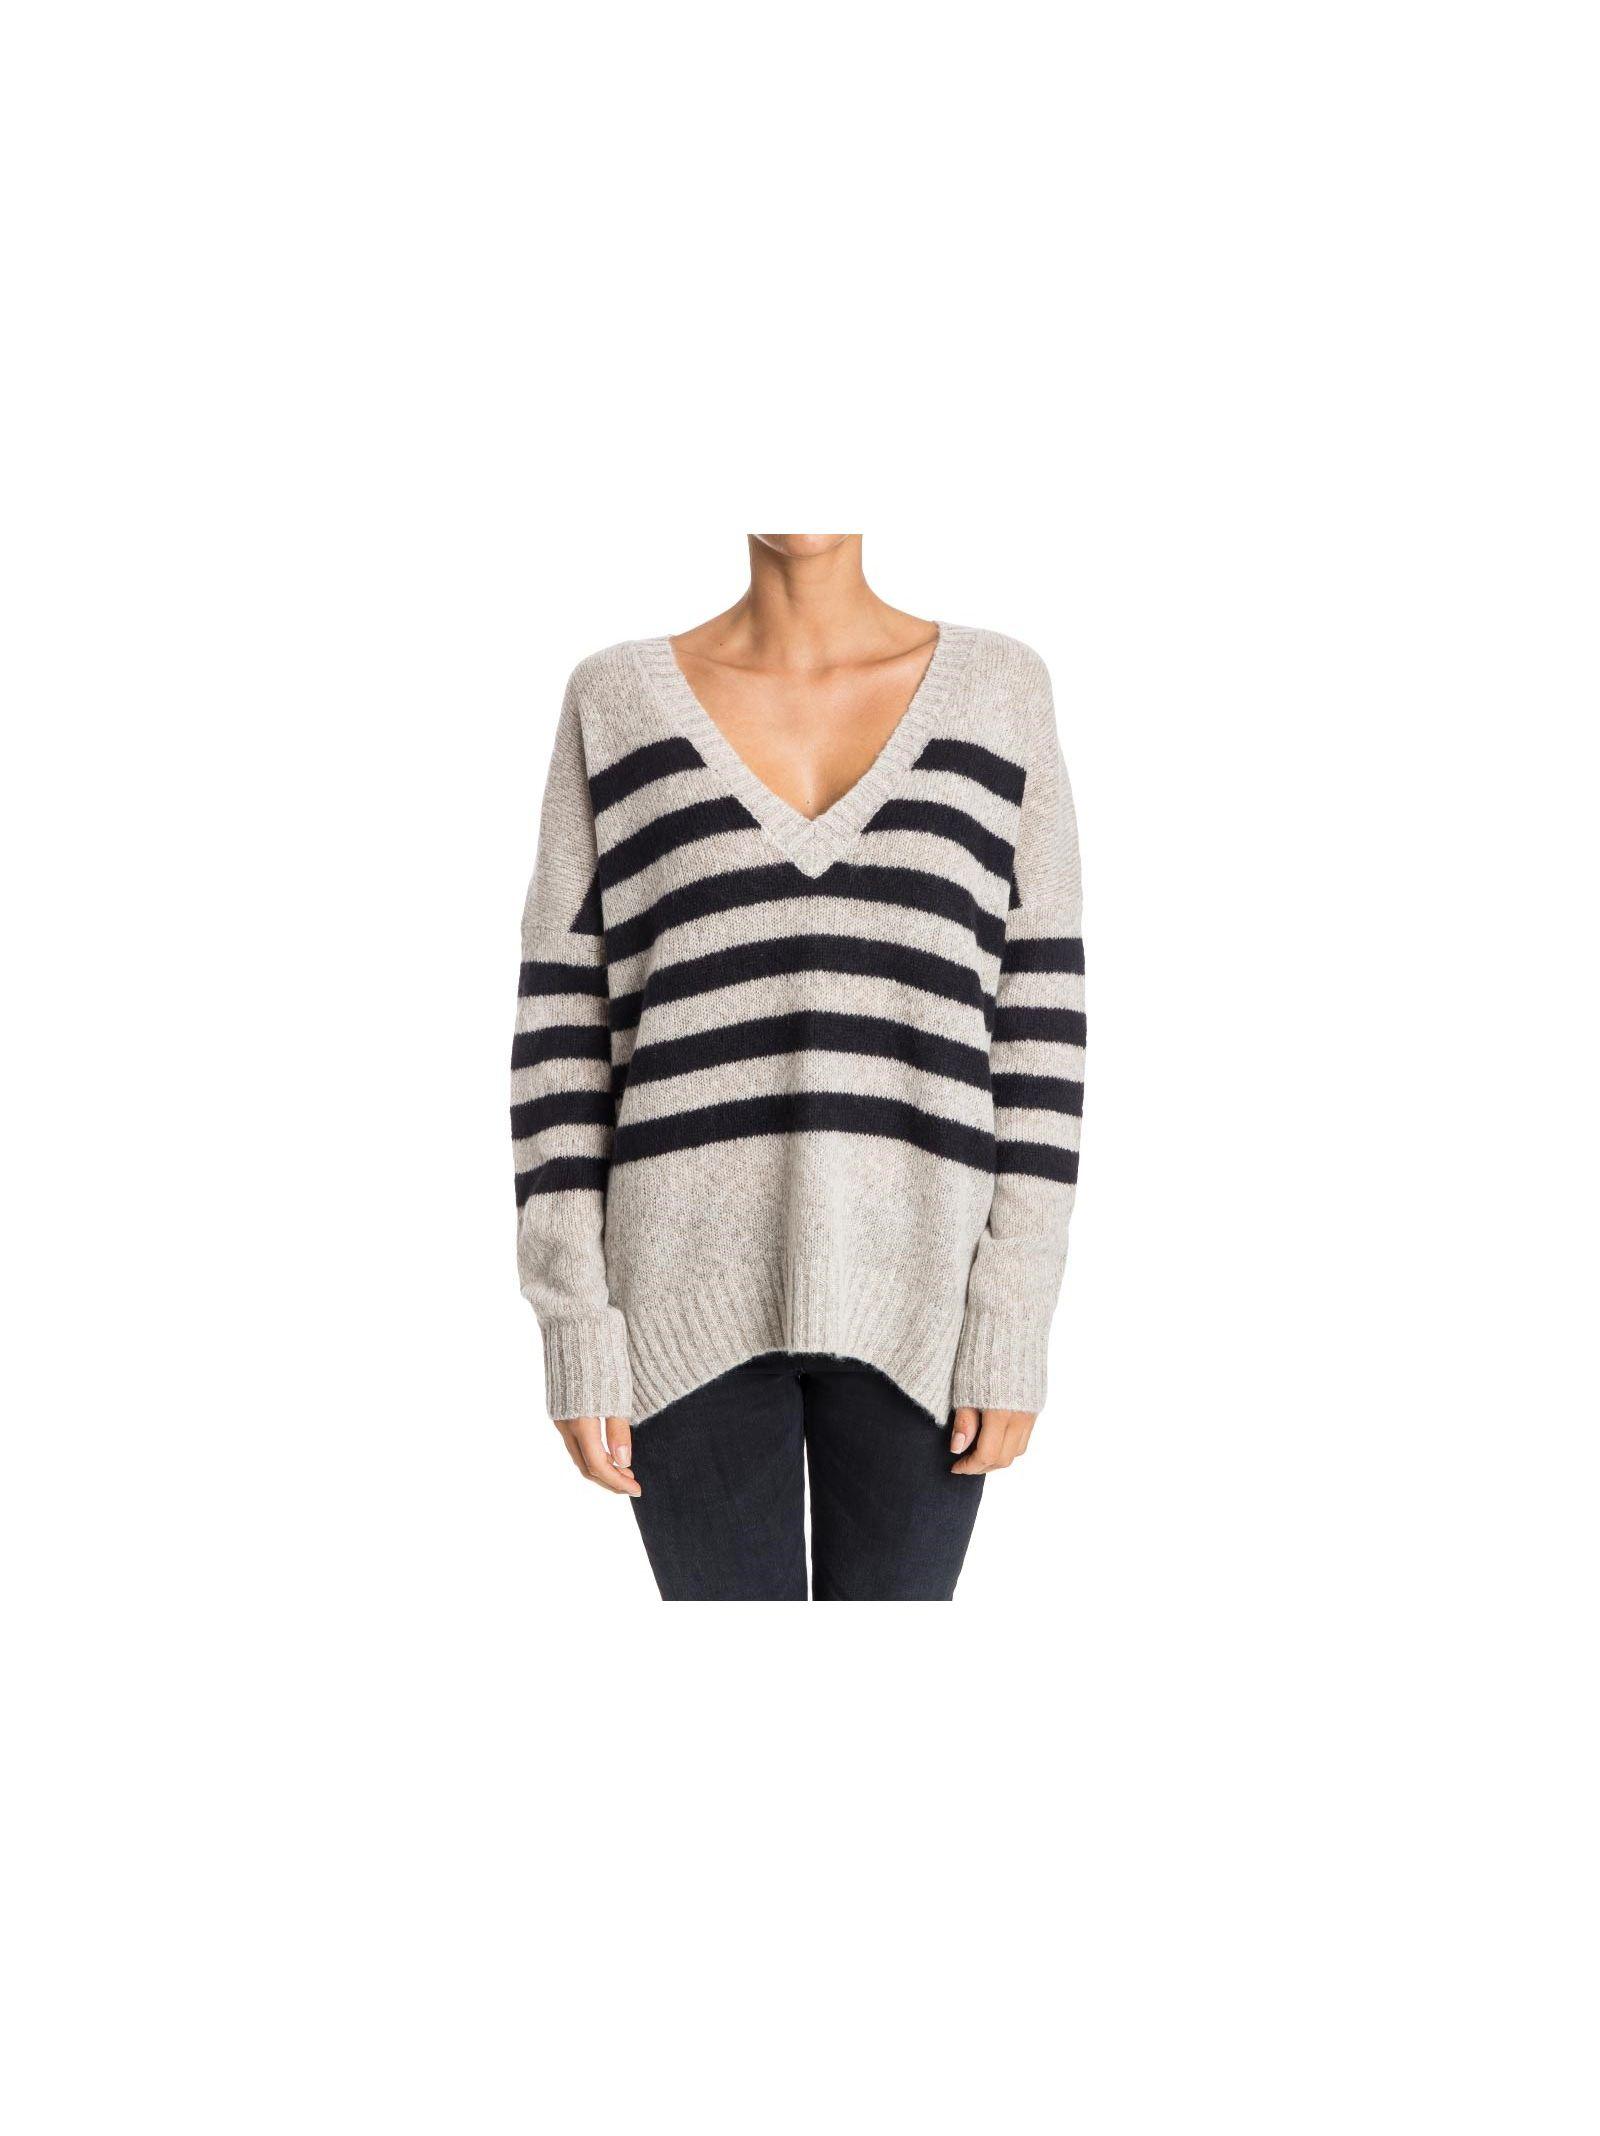 360 Cashmere - Cachemire Sweater - Monroe